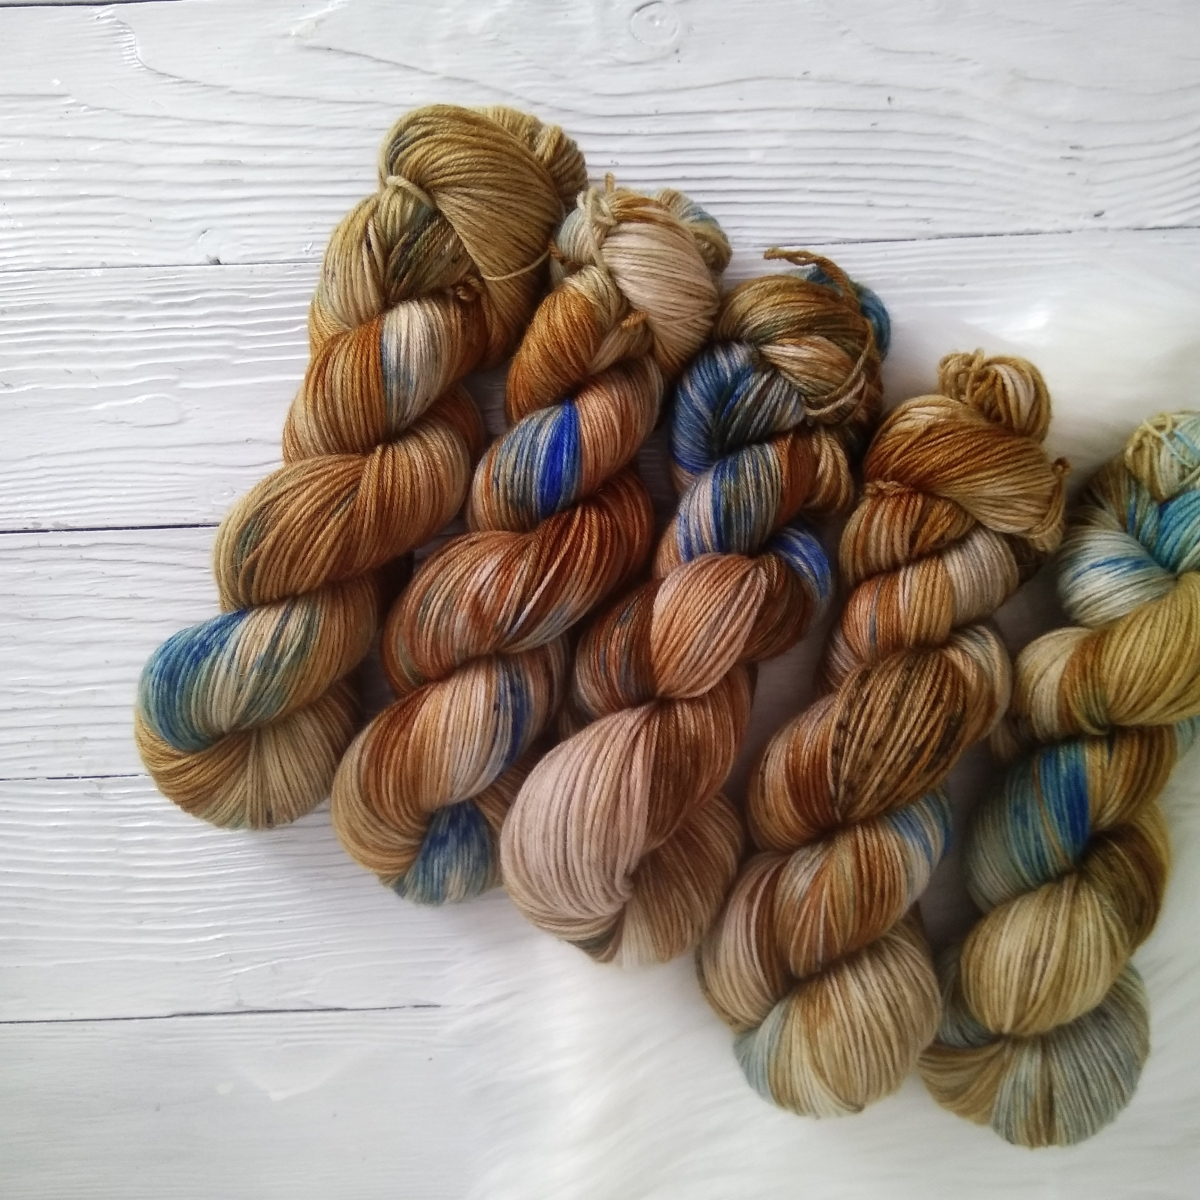 woodico.pro hand dyed yarn 036 4 1200x1200 - Hand dyed yarn / 036